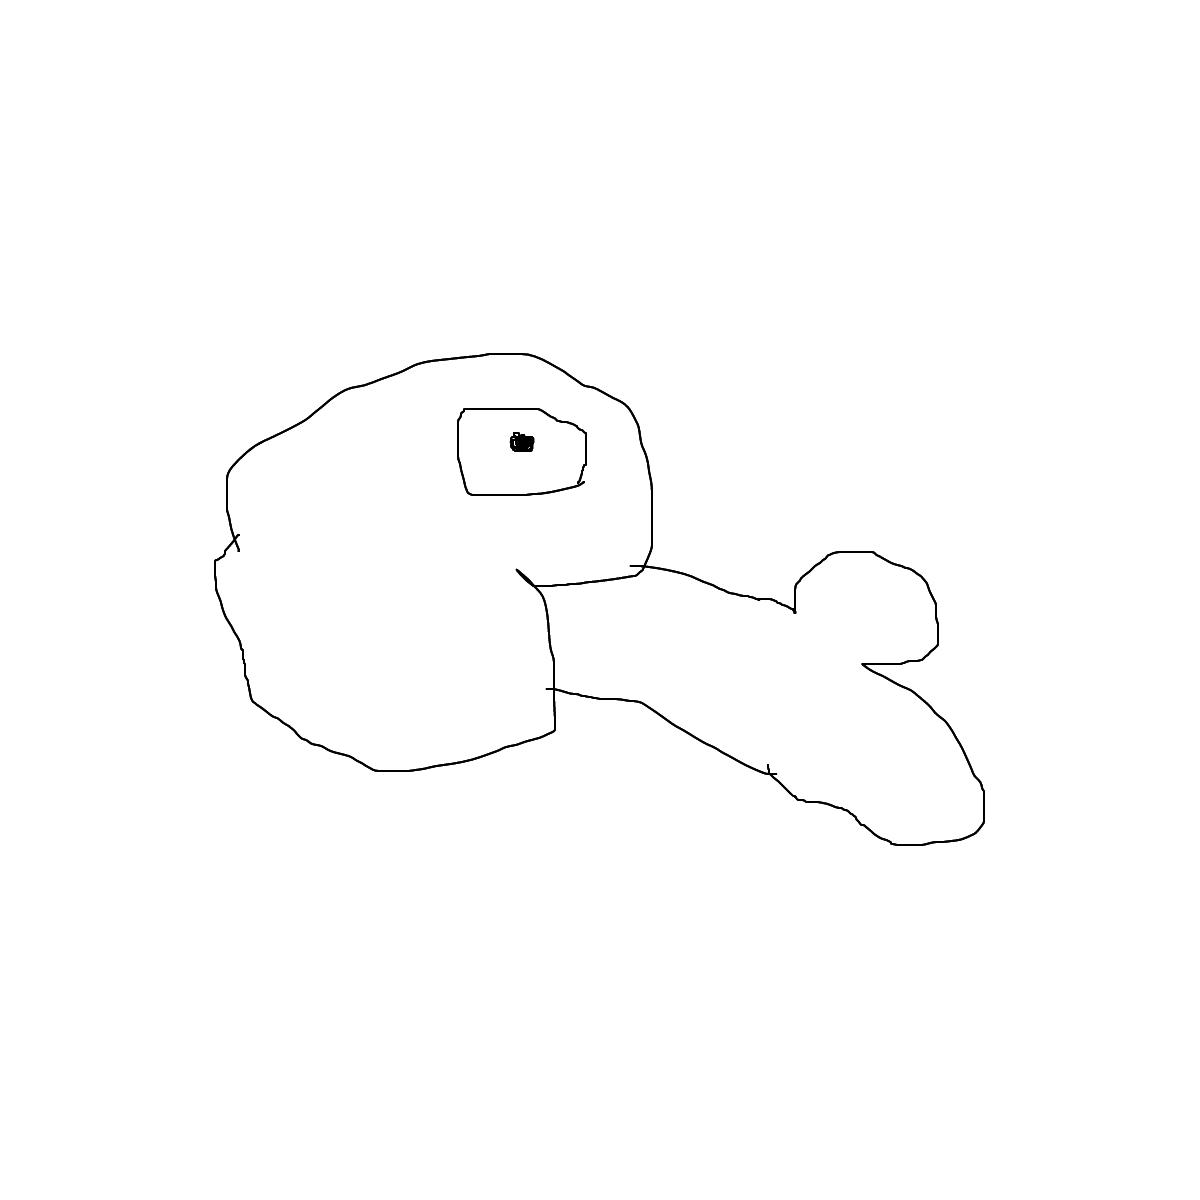 BAAAM drawing#19443 lat:54.2170715332031250lng: -6.2896680831909180